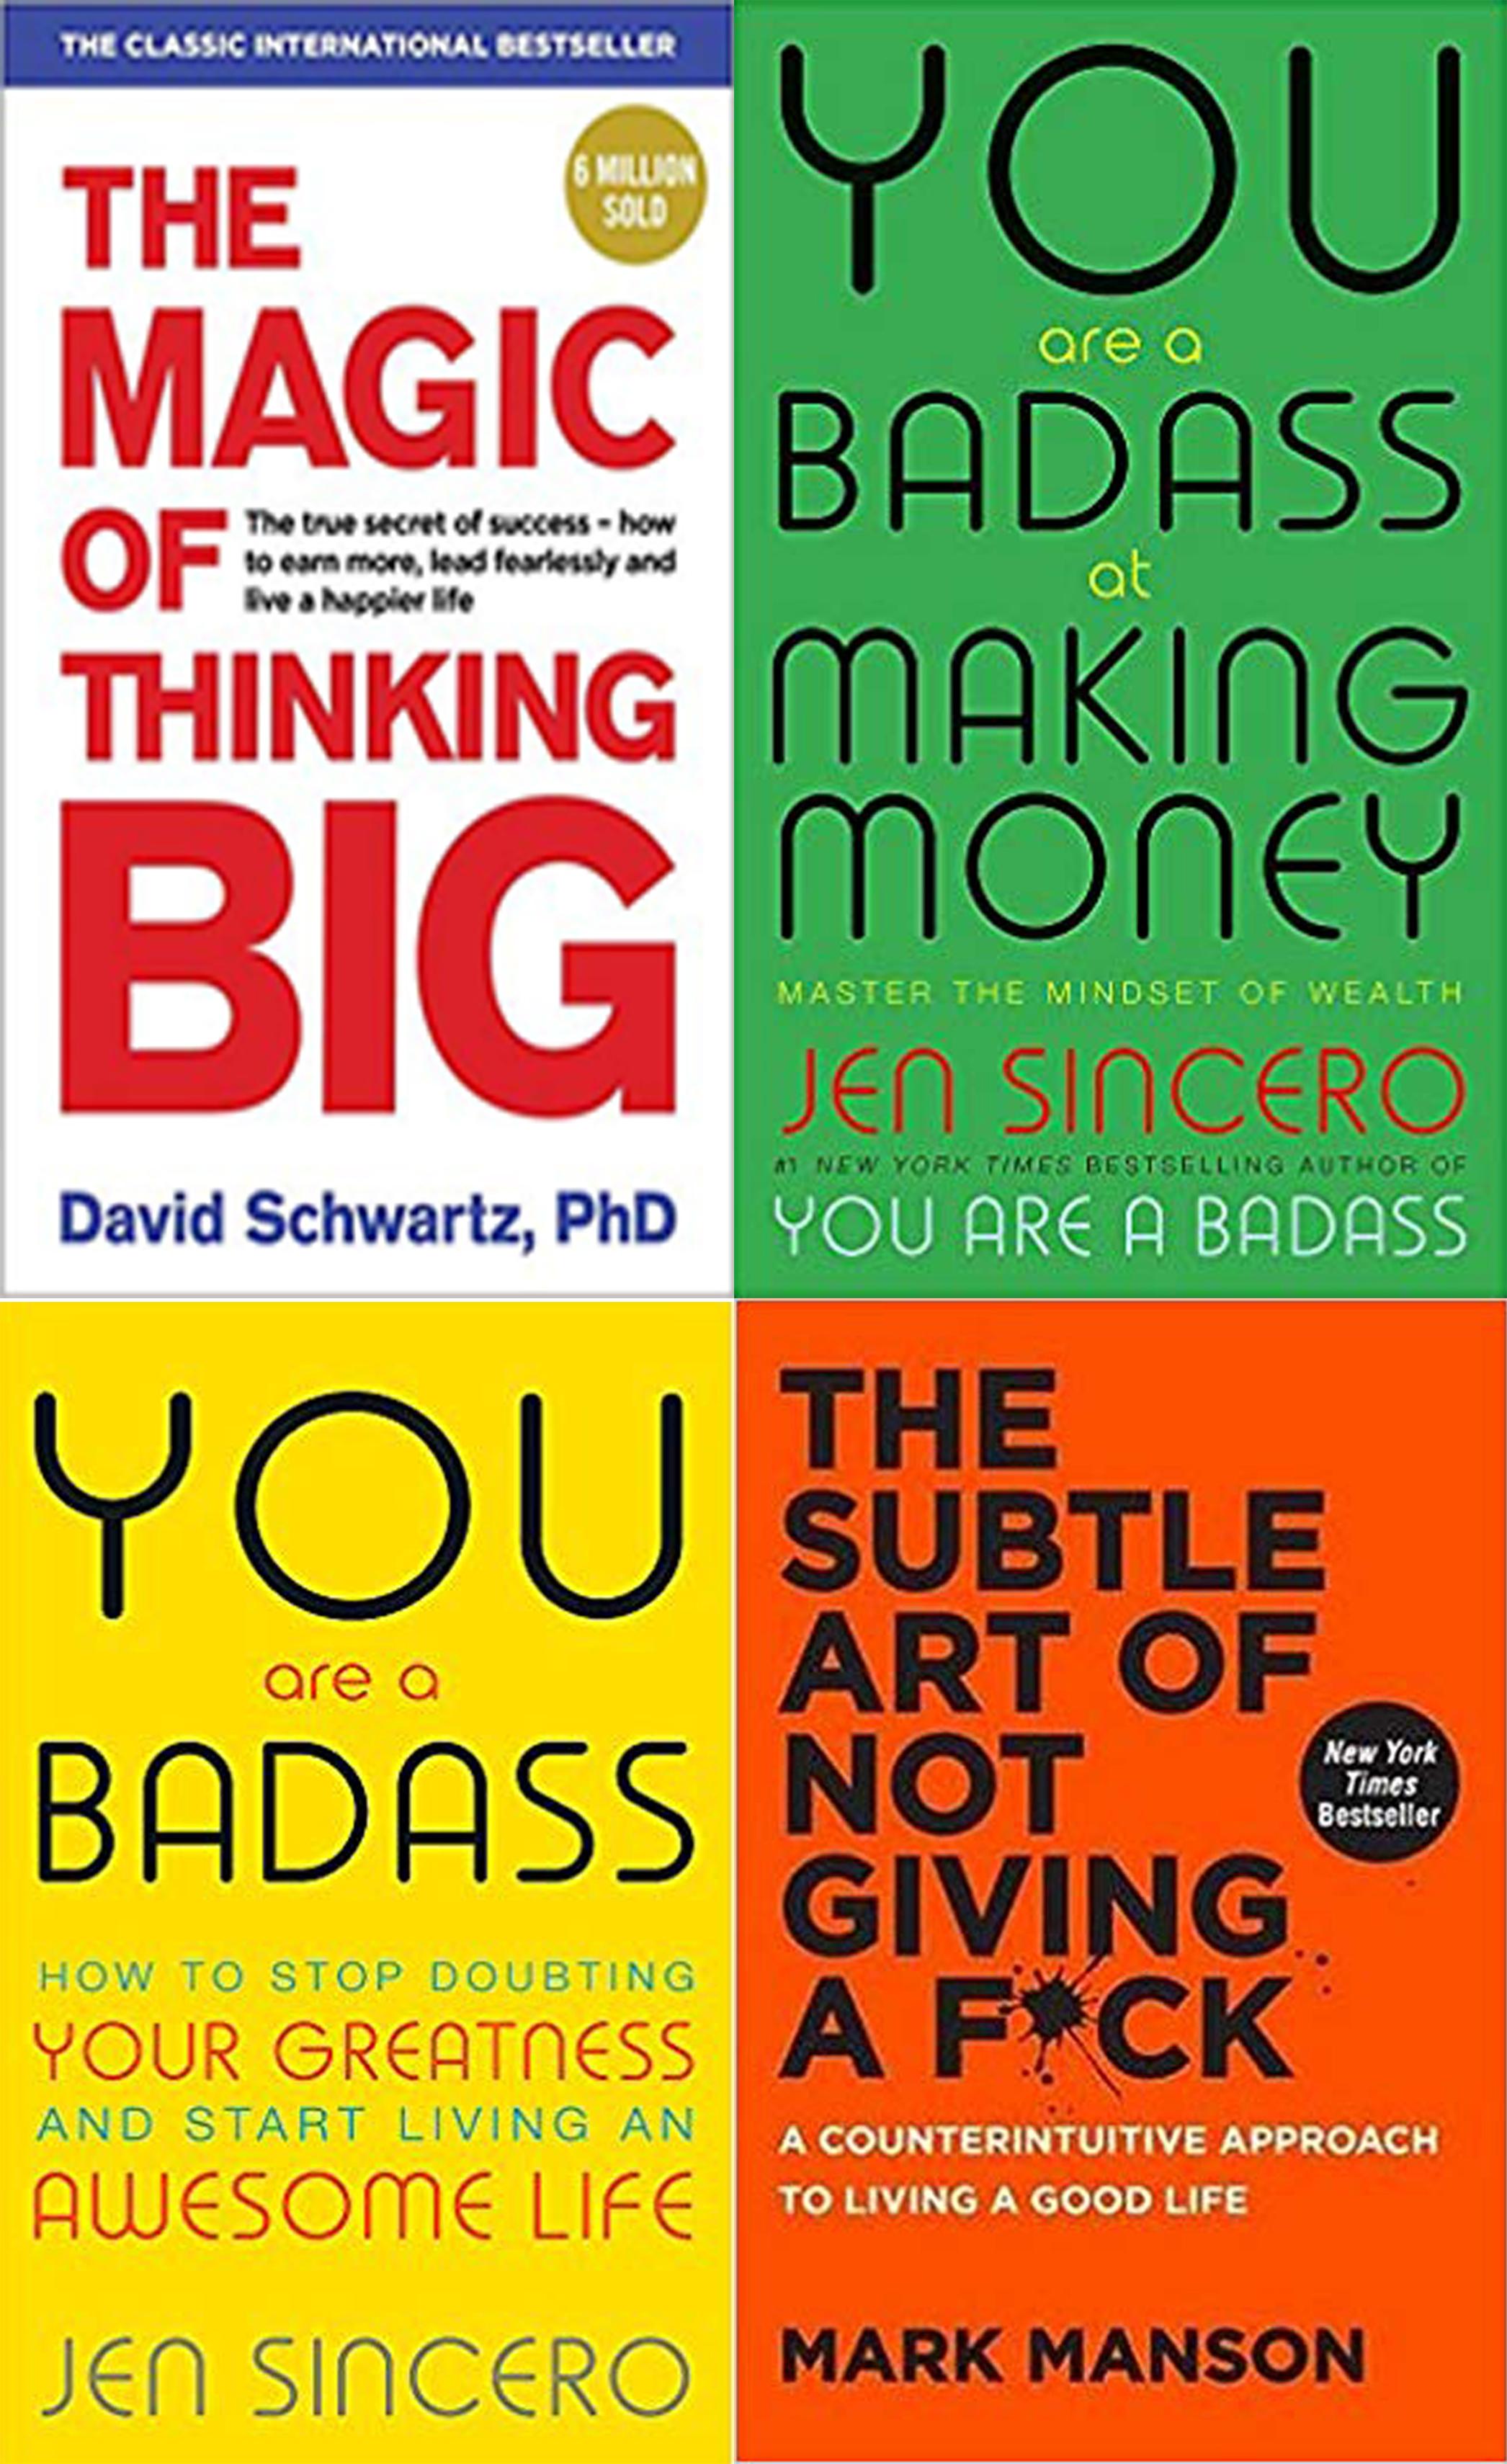 Best Self Help Book